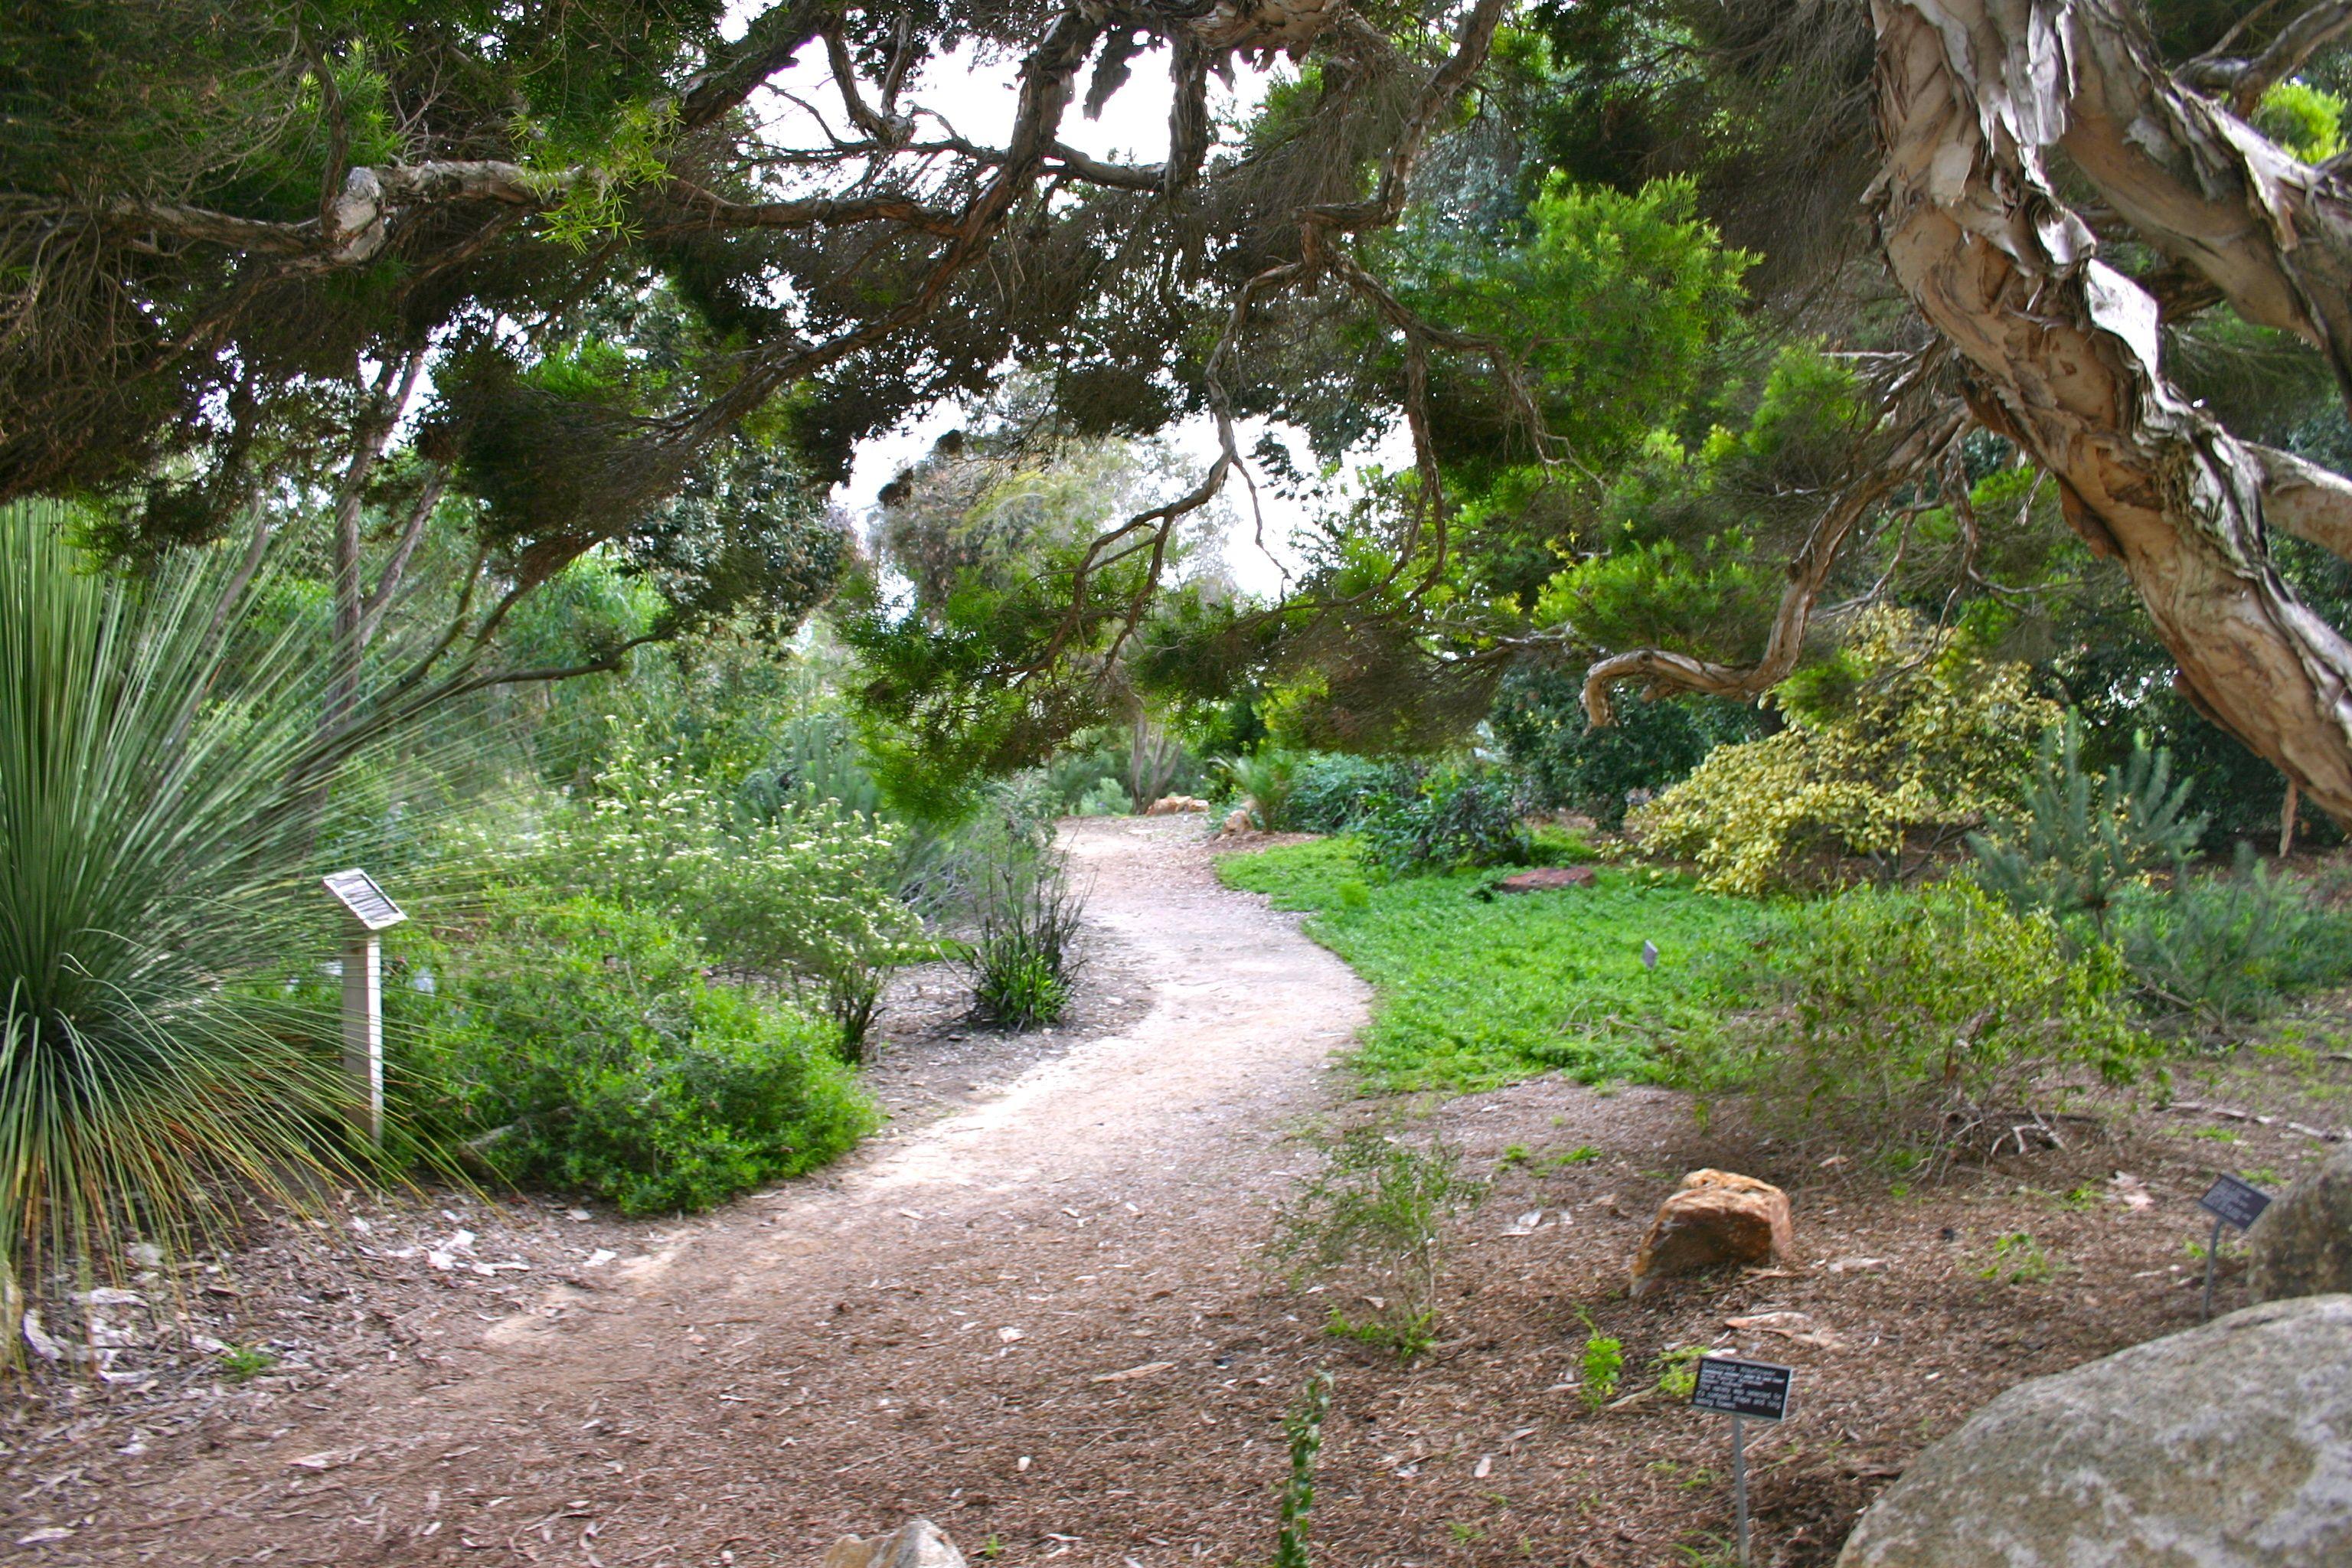 San diego botanic garden california roadtrippers - Quails inn restaurant san marcos ...